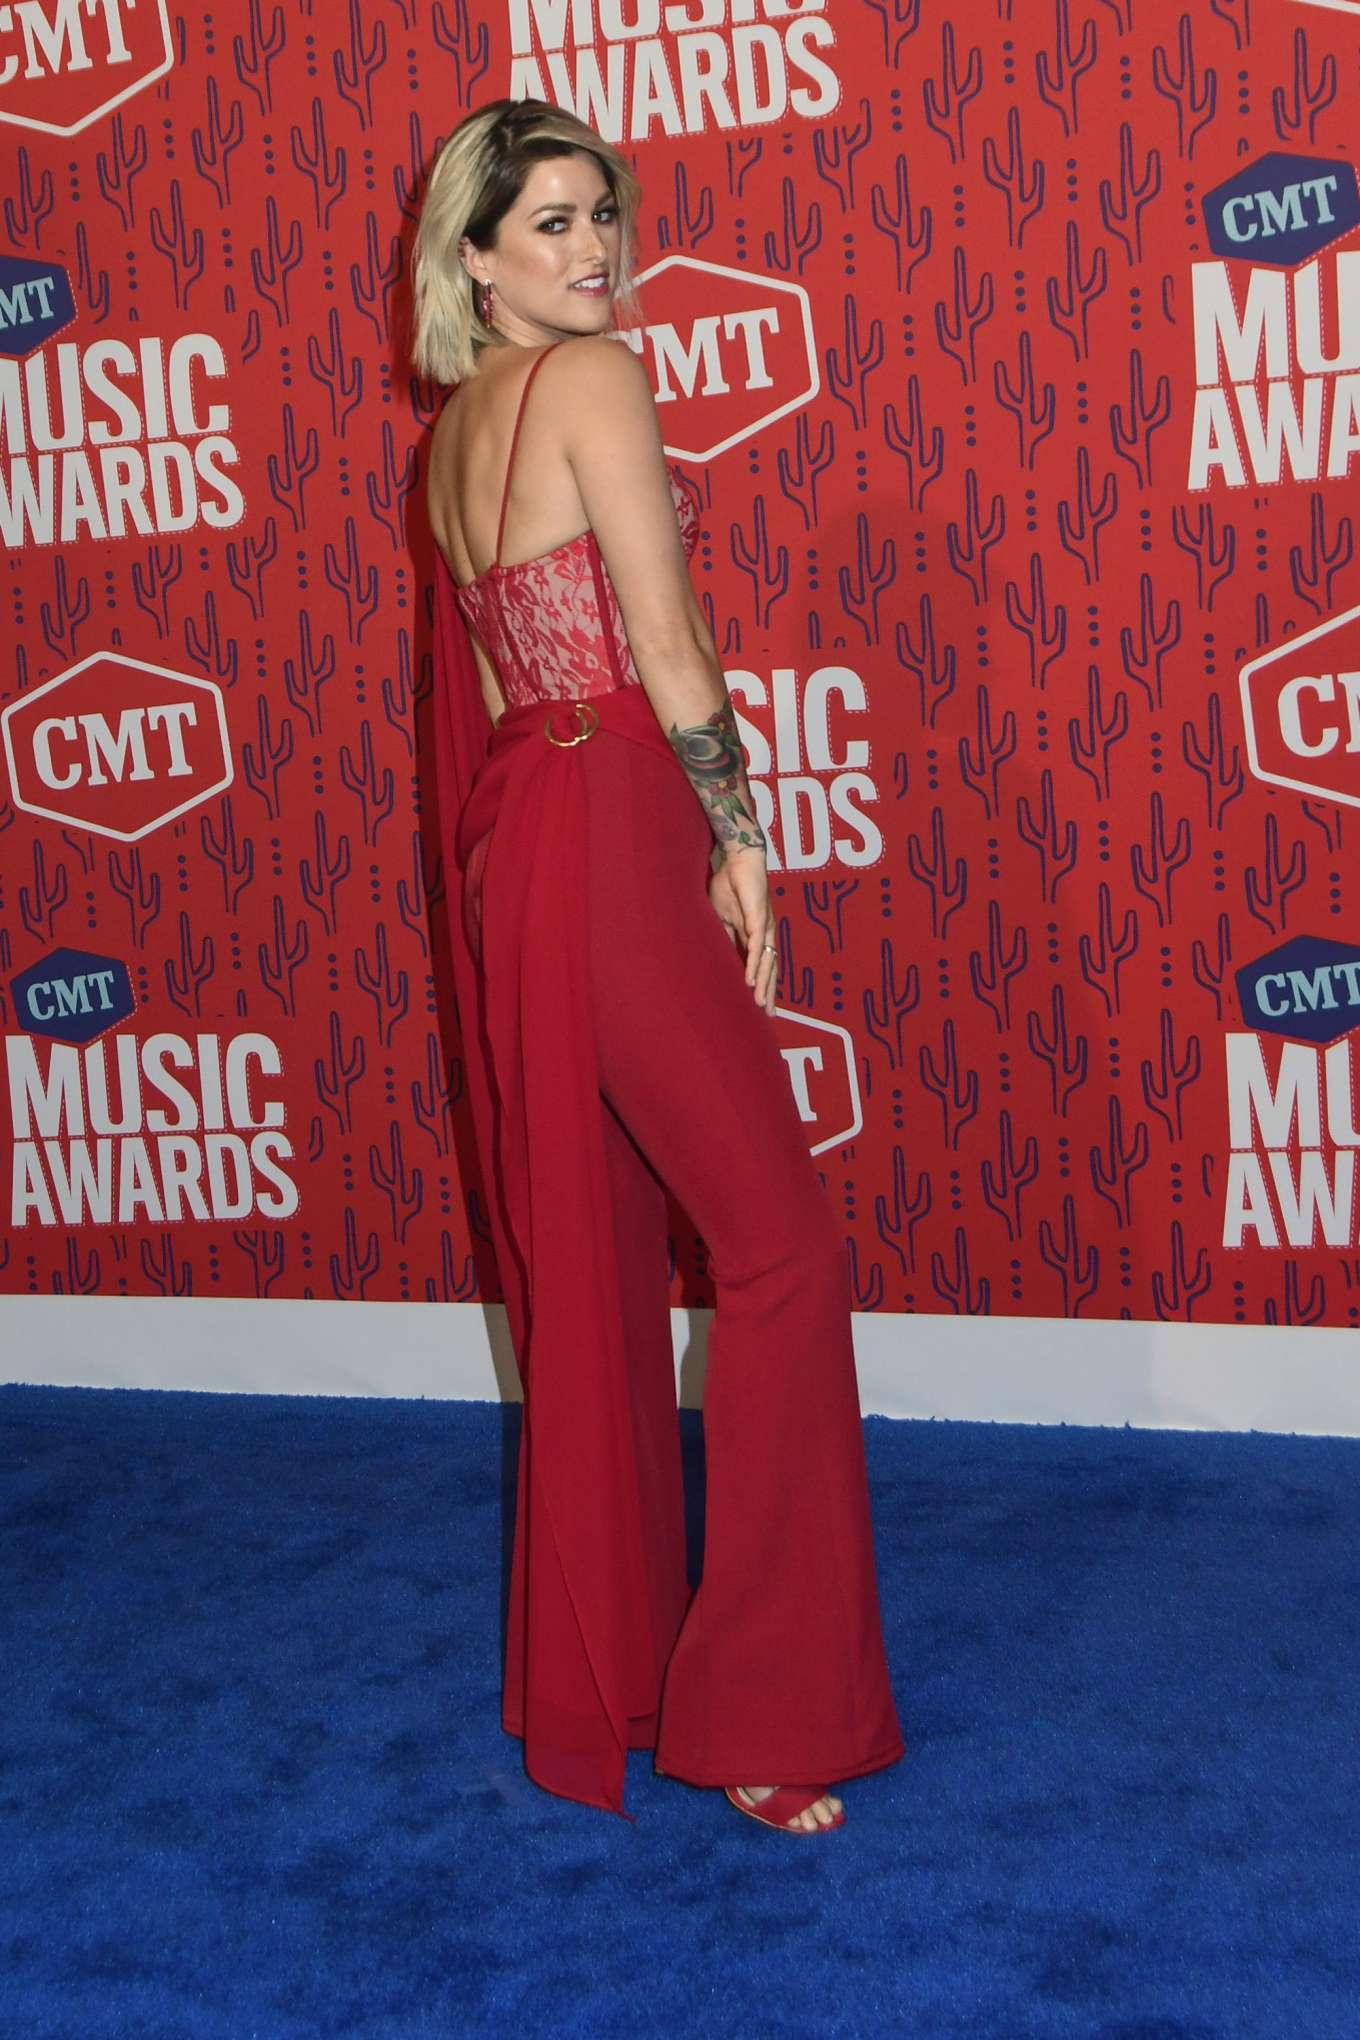 Cassadee Pope 2019 : Cassadee Pope: 2019 CMT Music Awards-36